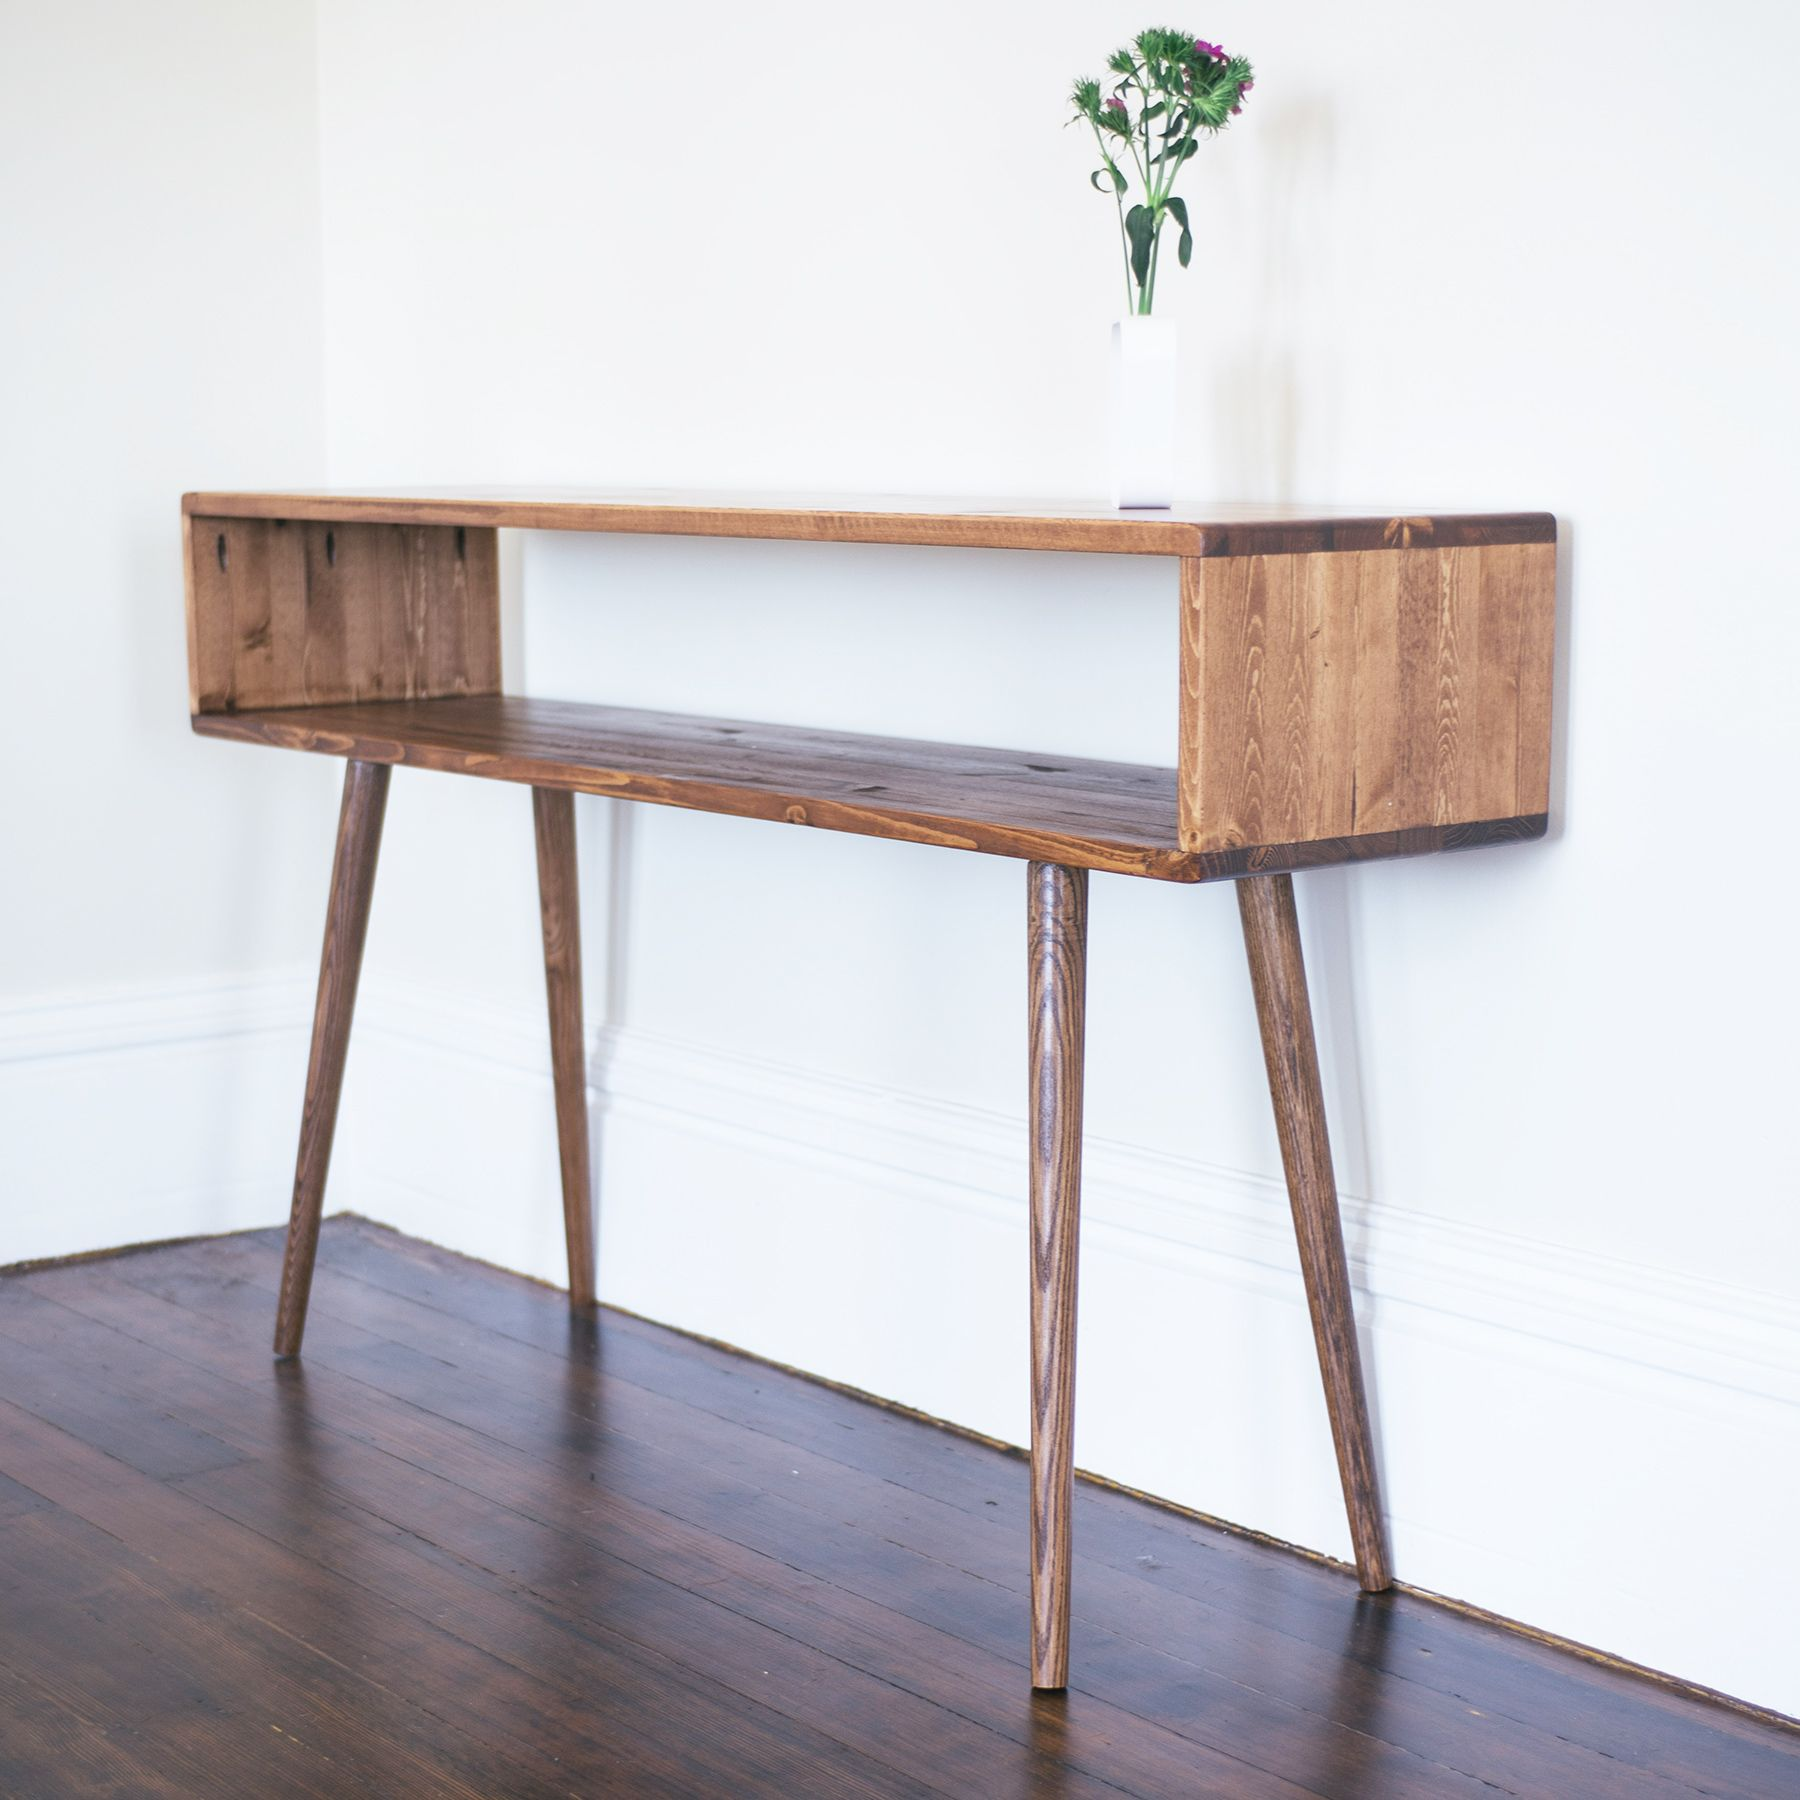 Sensational Furniture And Decor For The Modern Lifestyle In 2019 Creativecarmelina Interior Chair Design Creativecarmelinacom